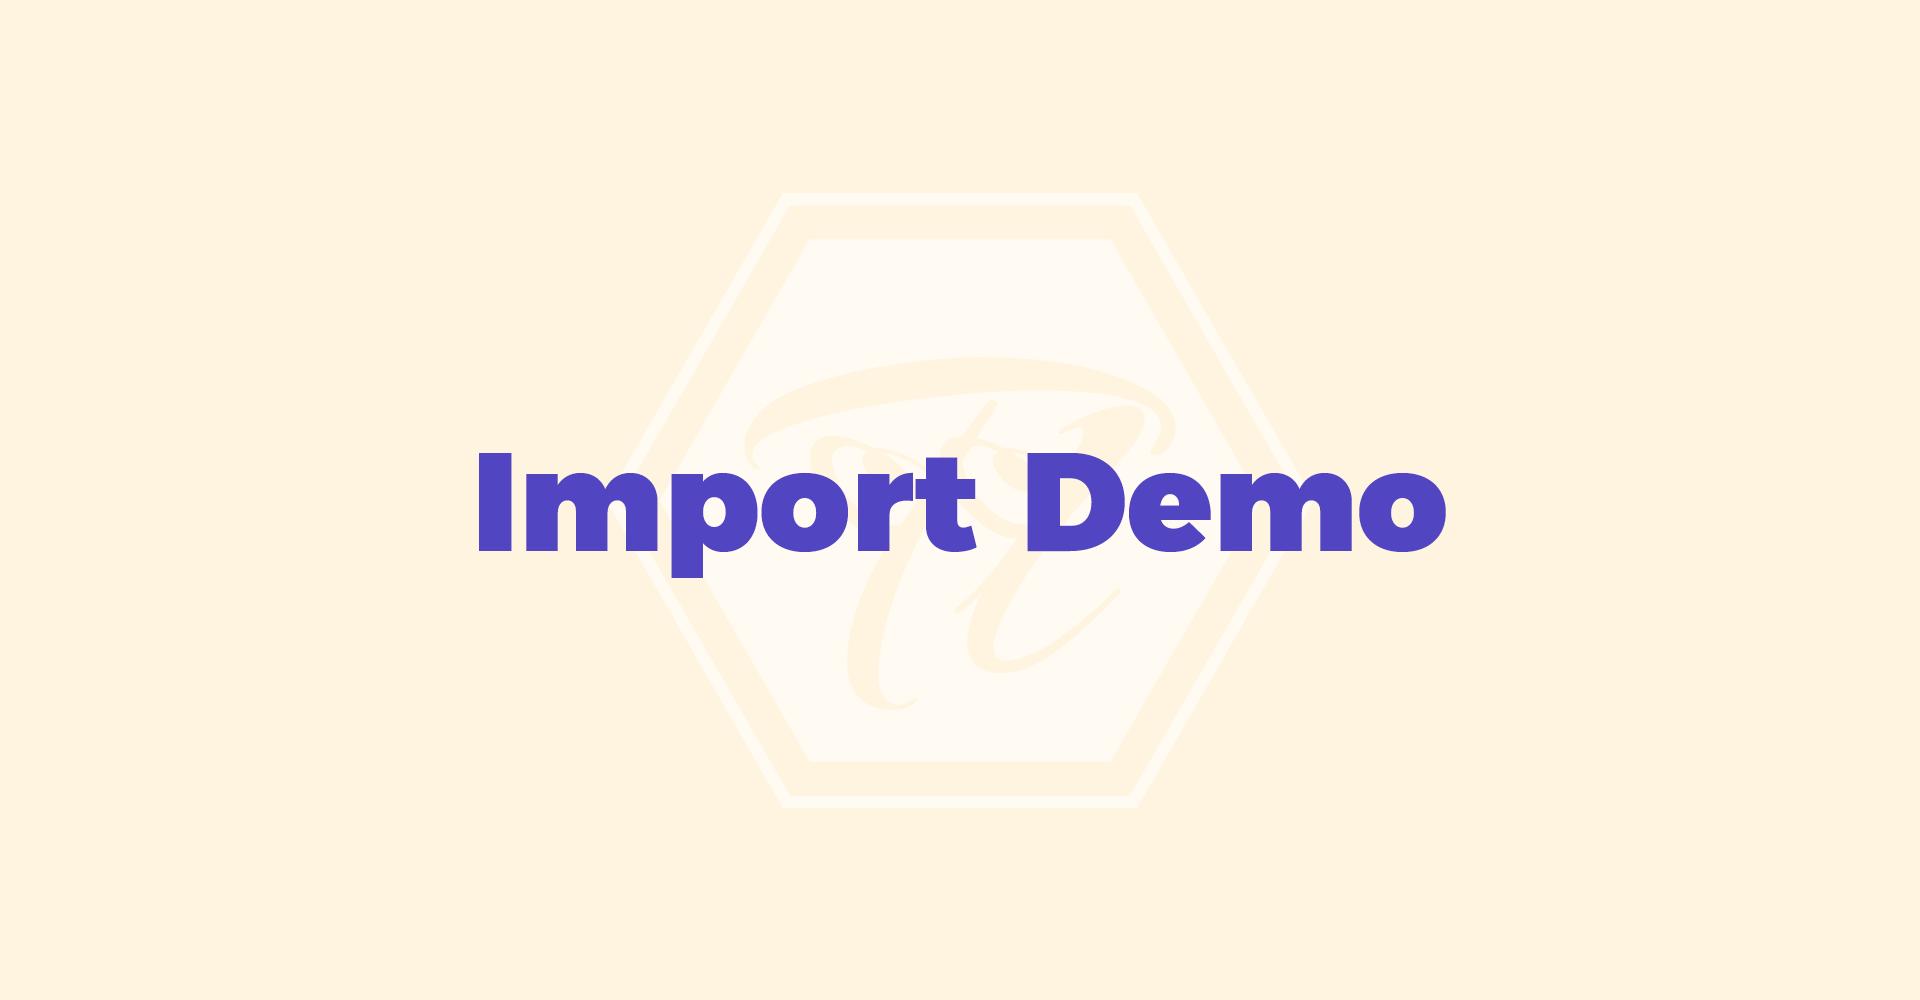 import_demo 1 1 1 2